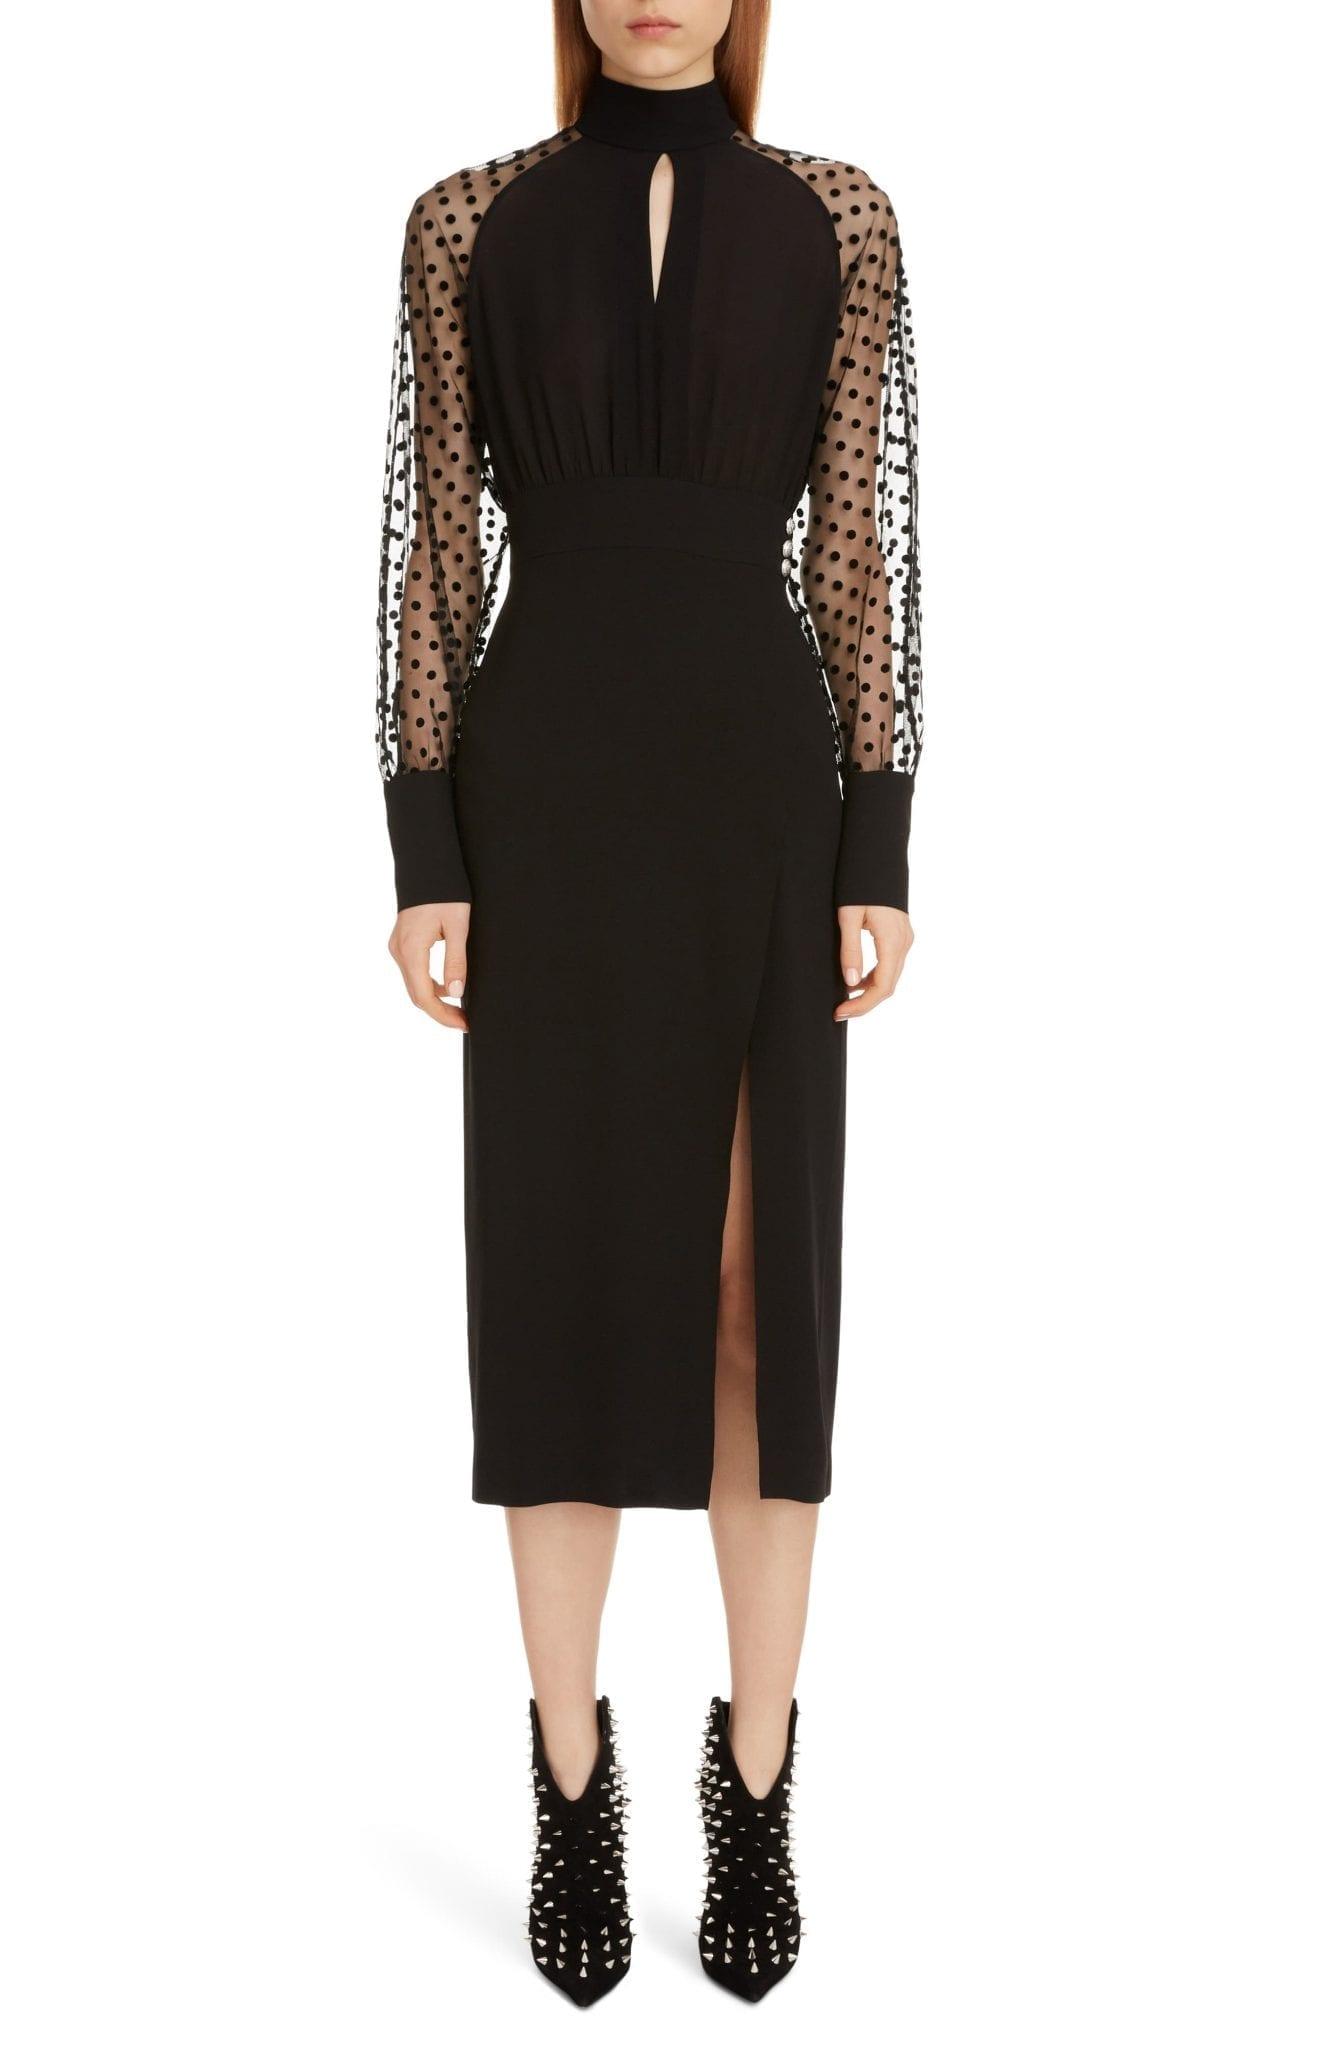 BALMAIN Swiss Dot & Crepe Long Sleeve Midi Dress